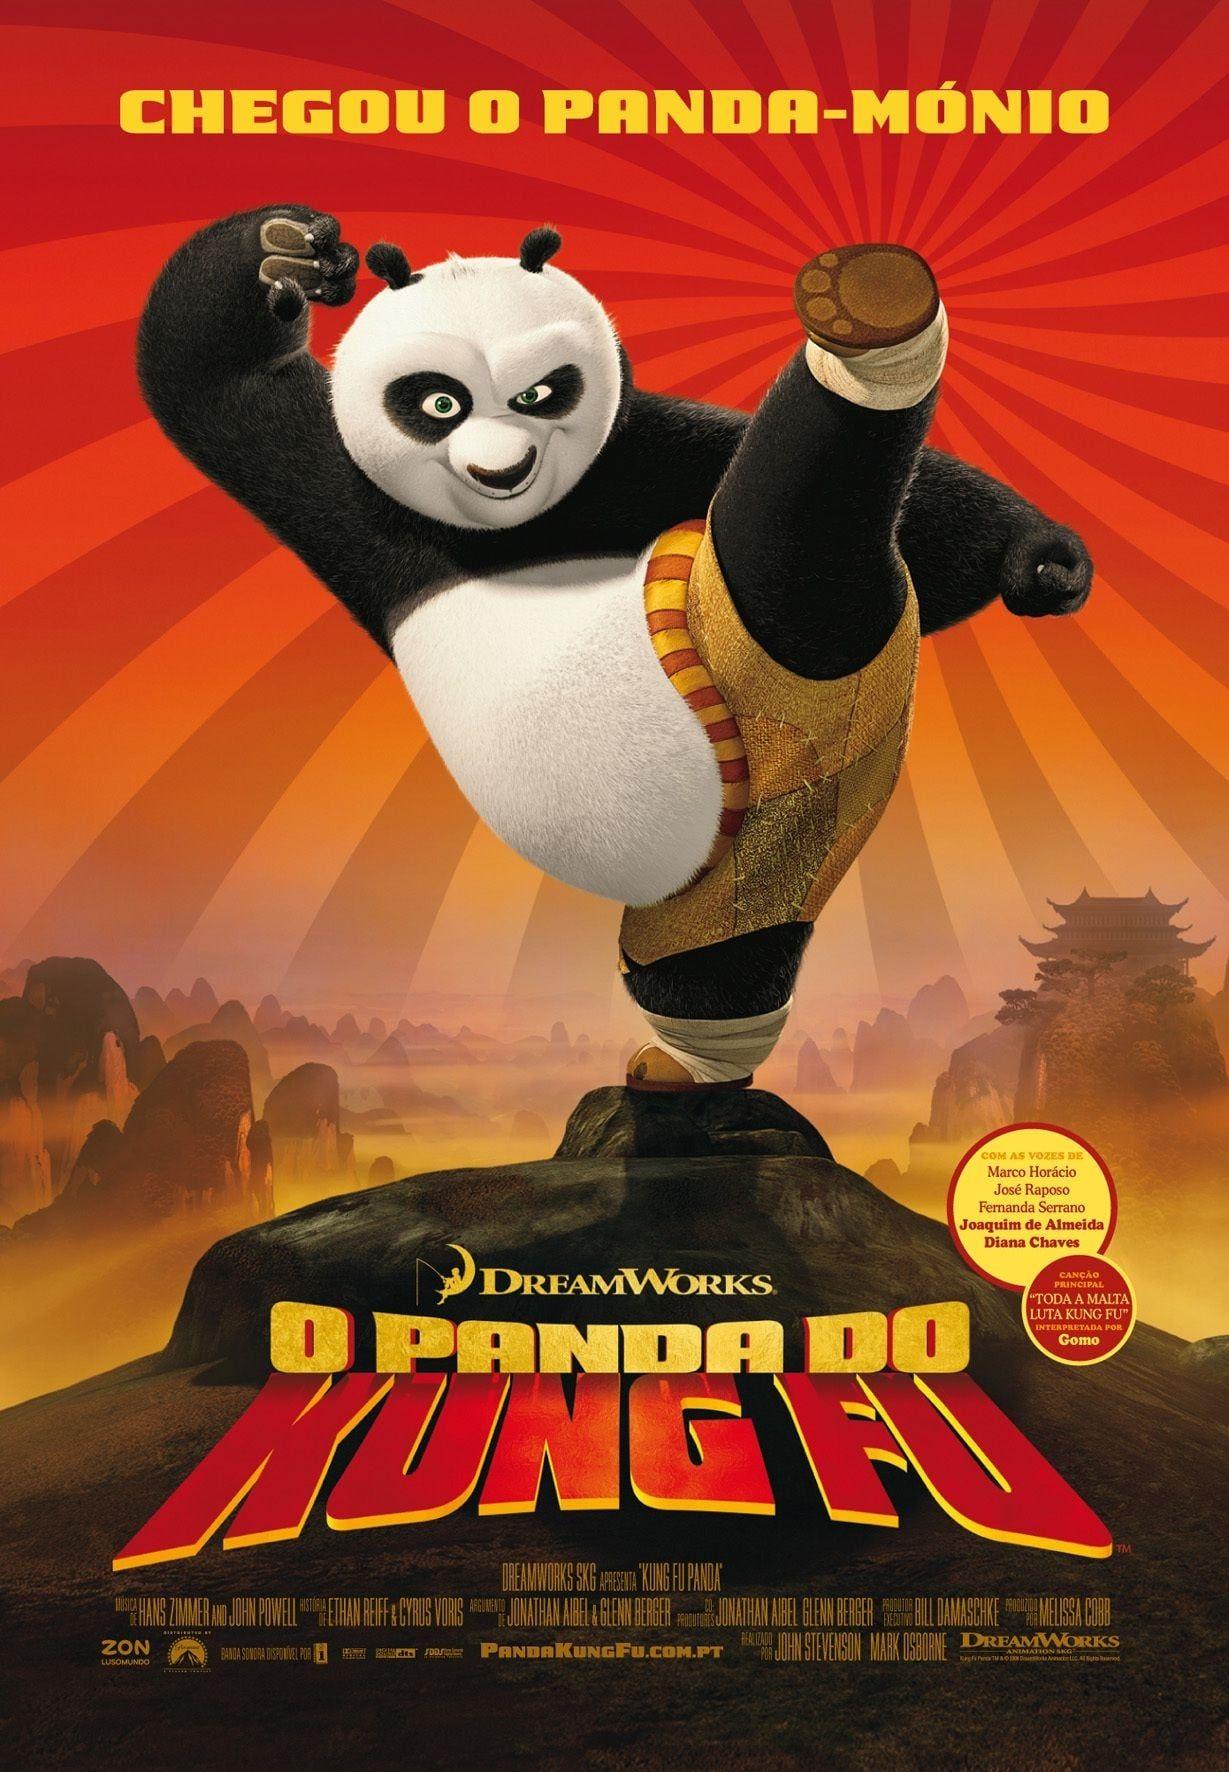 Kung Fu Panda Film Online Hungary Magyarul Kungfupanda Teljes Magyar Film Videa 2019 Mafab Mozi Indavideo Kung Fu Panda Panda Movies Kung Fu